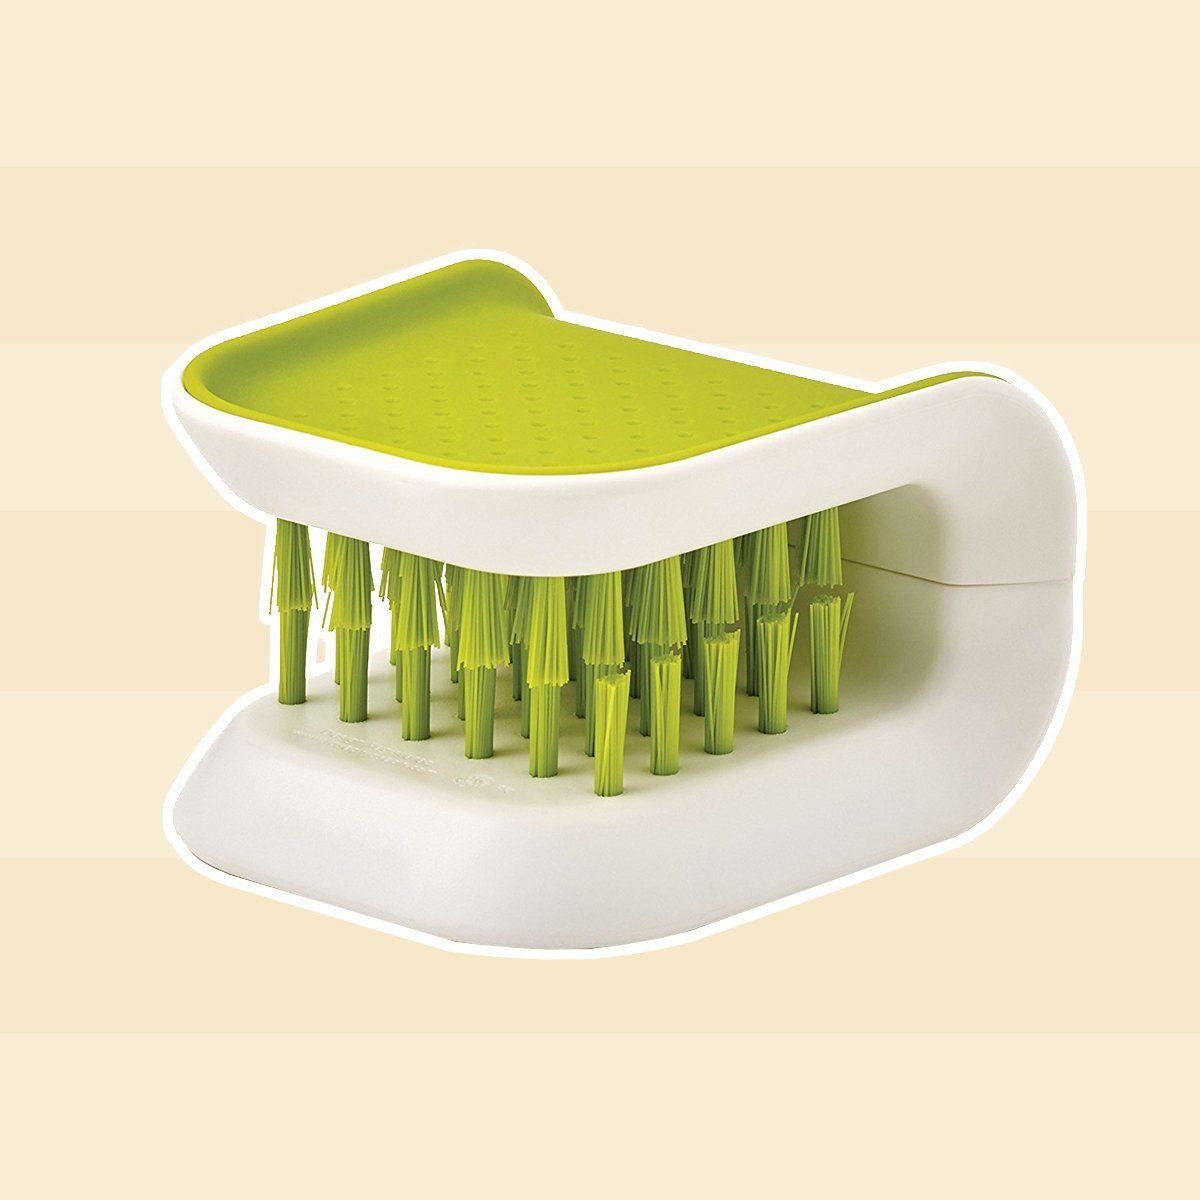 Cutlery Cleaner Brush